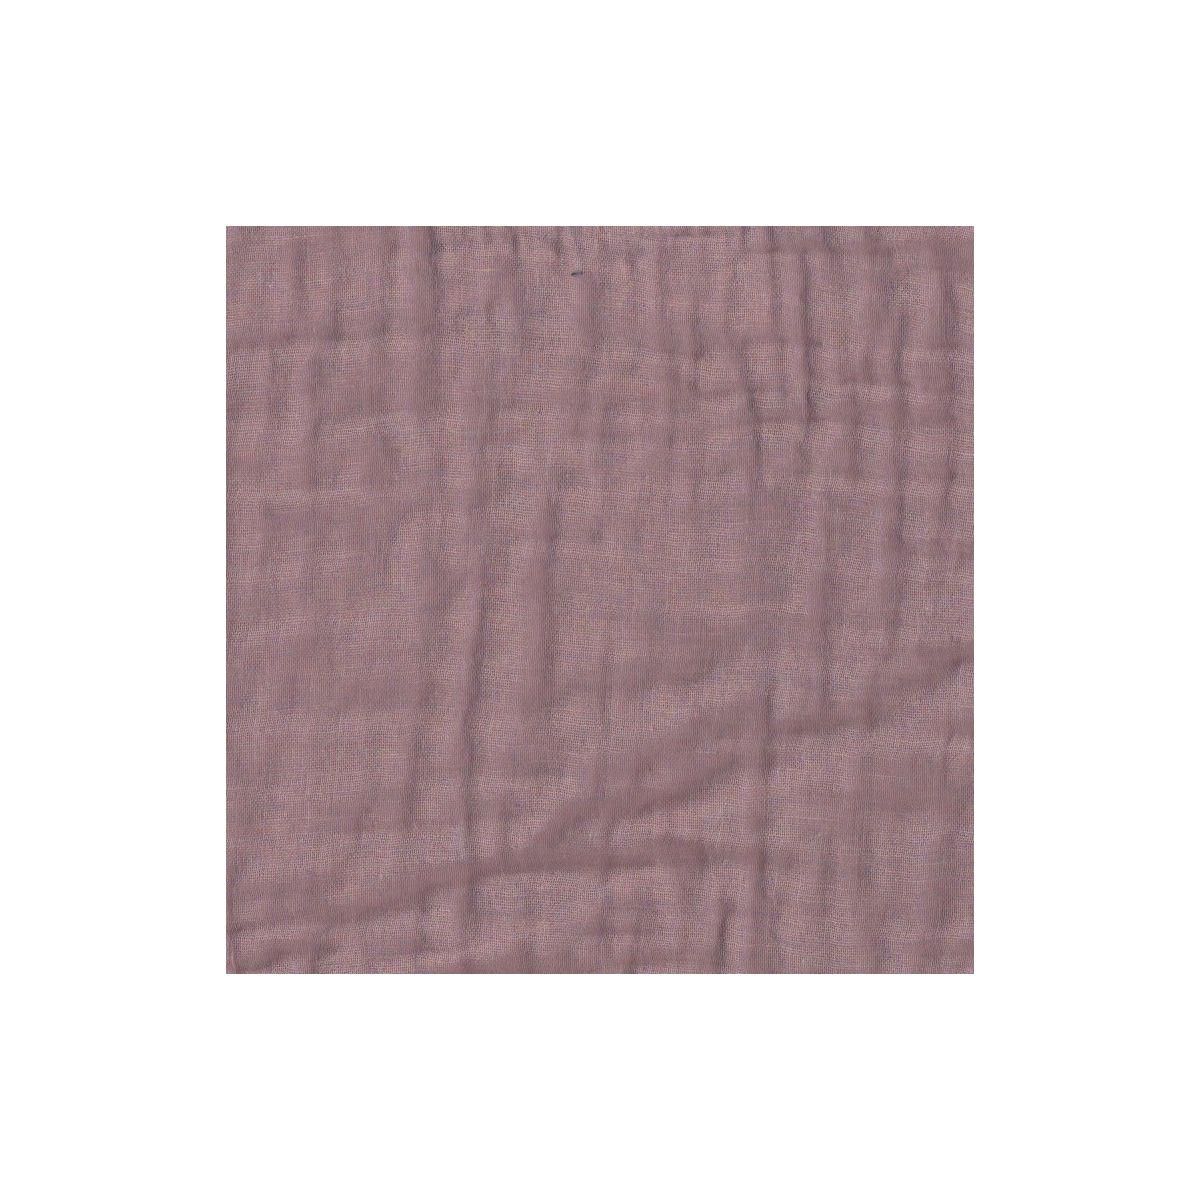 Duvet Cover Set dusty pink - Numero 74